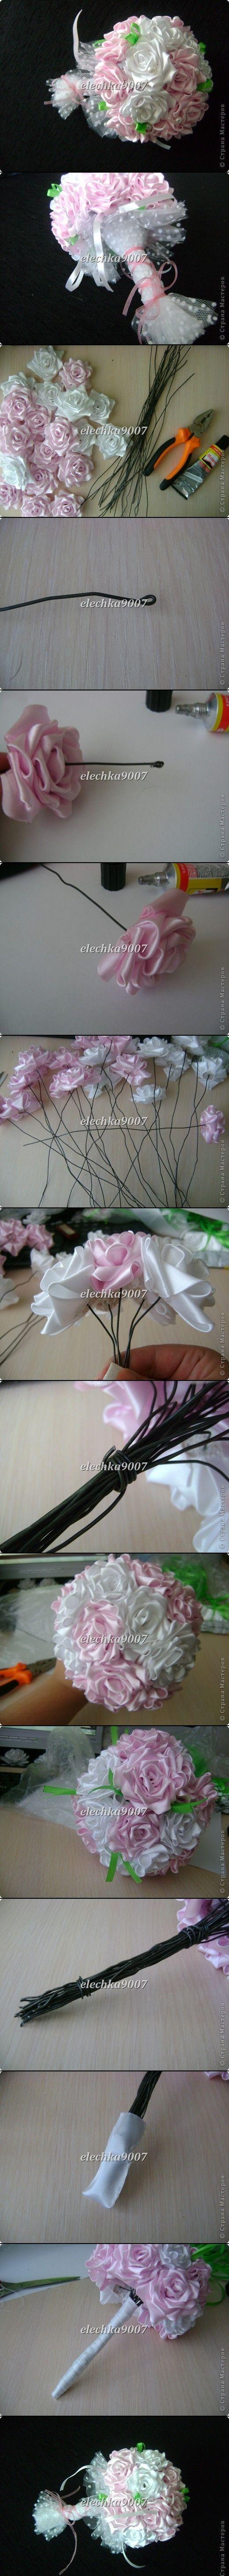 Bouque de rosas de fita de cetim